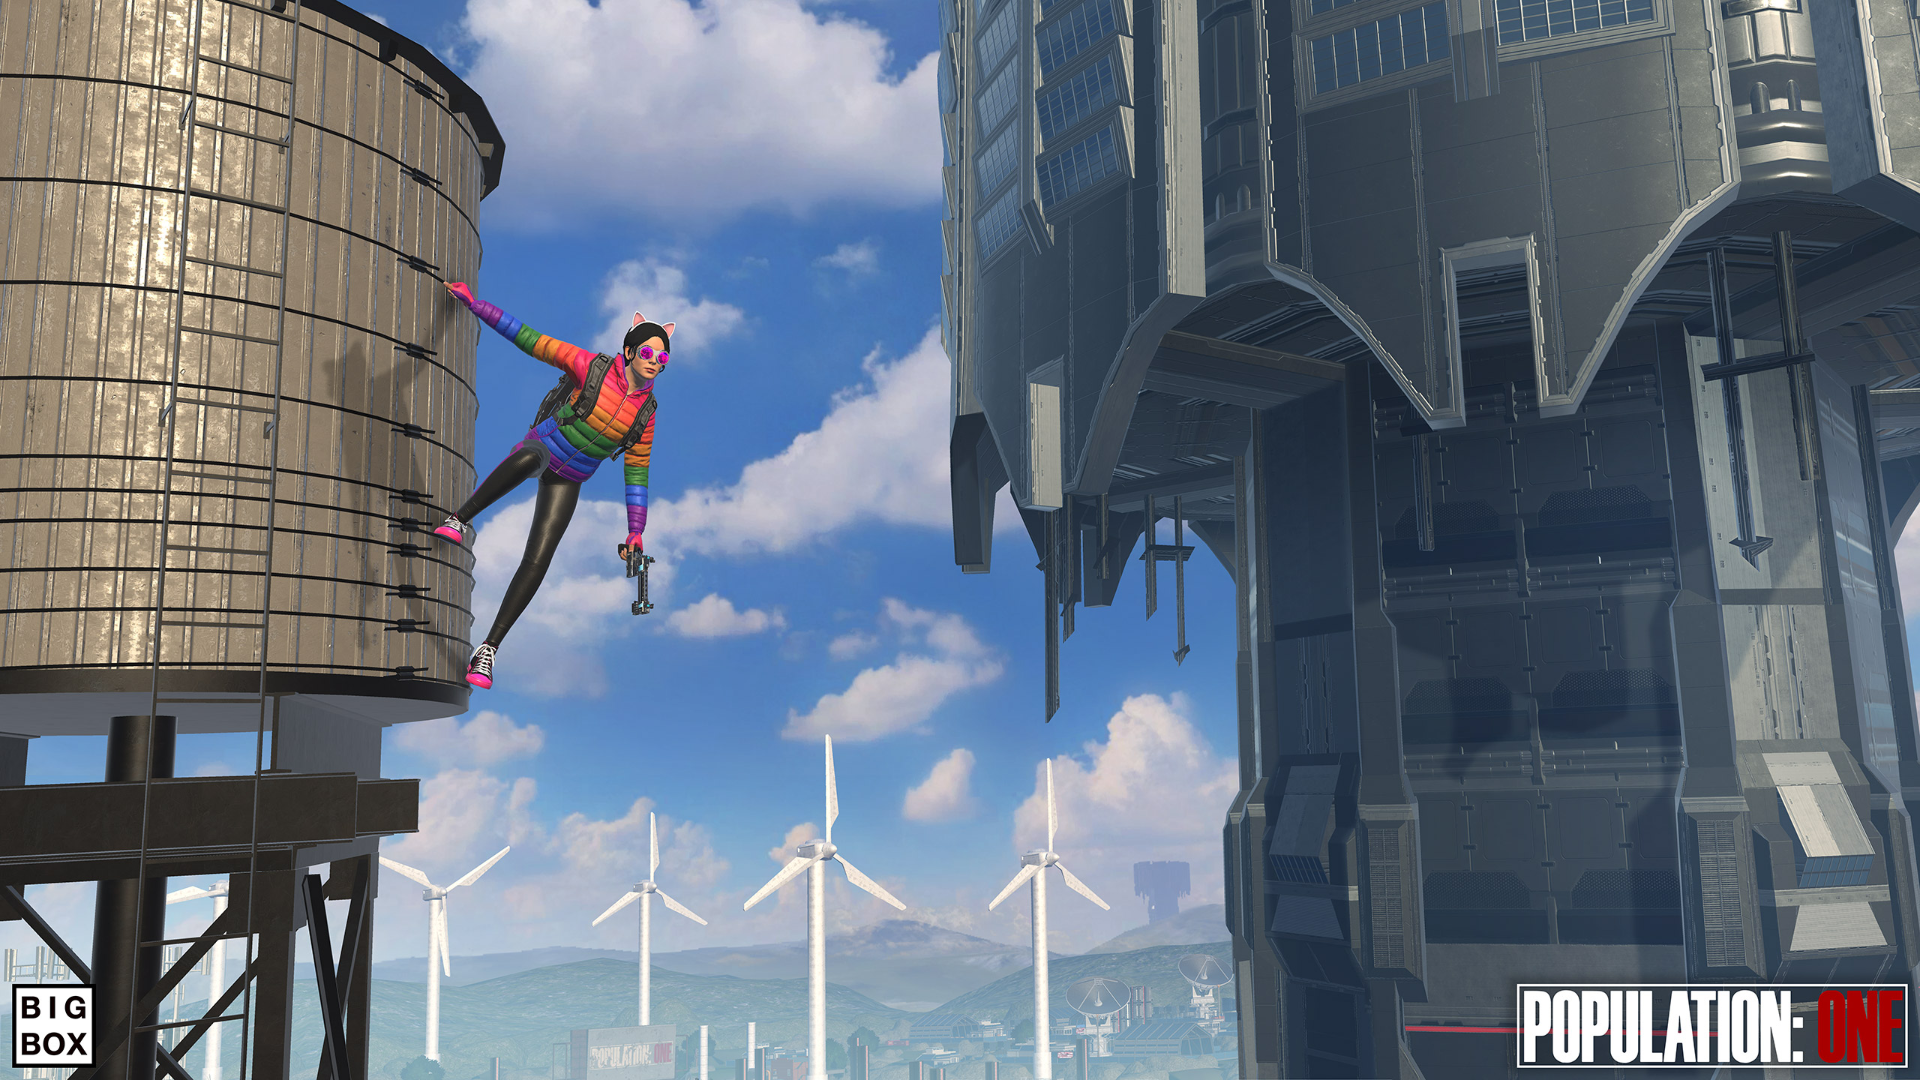 VREvolution.gg Launches VR Esports League Platform with Population: One Tournament